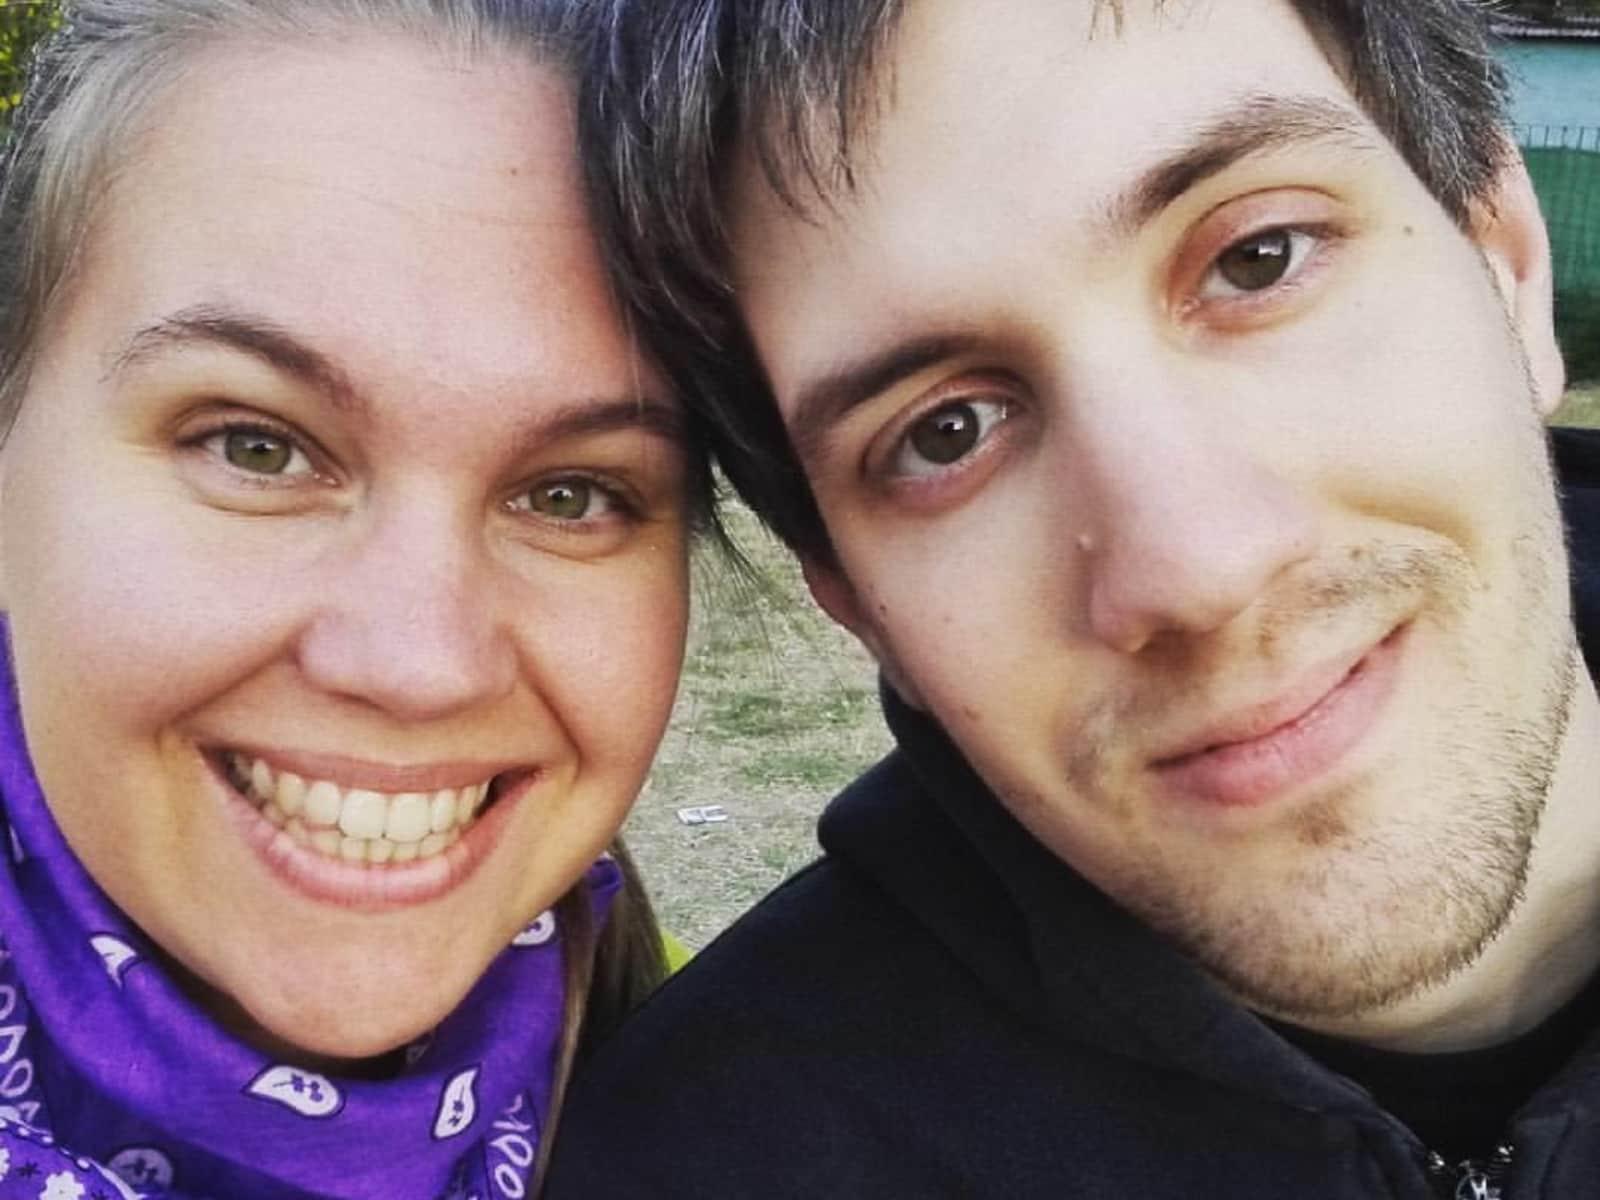 Helen & Hector victor from Melbourne, Victoria, Australia